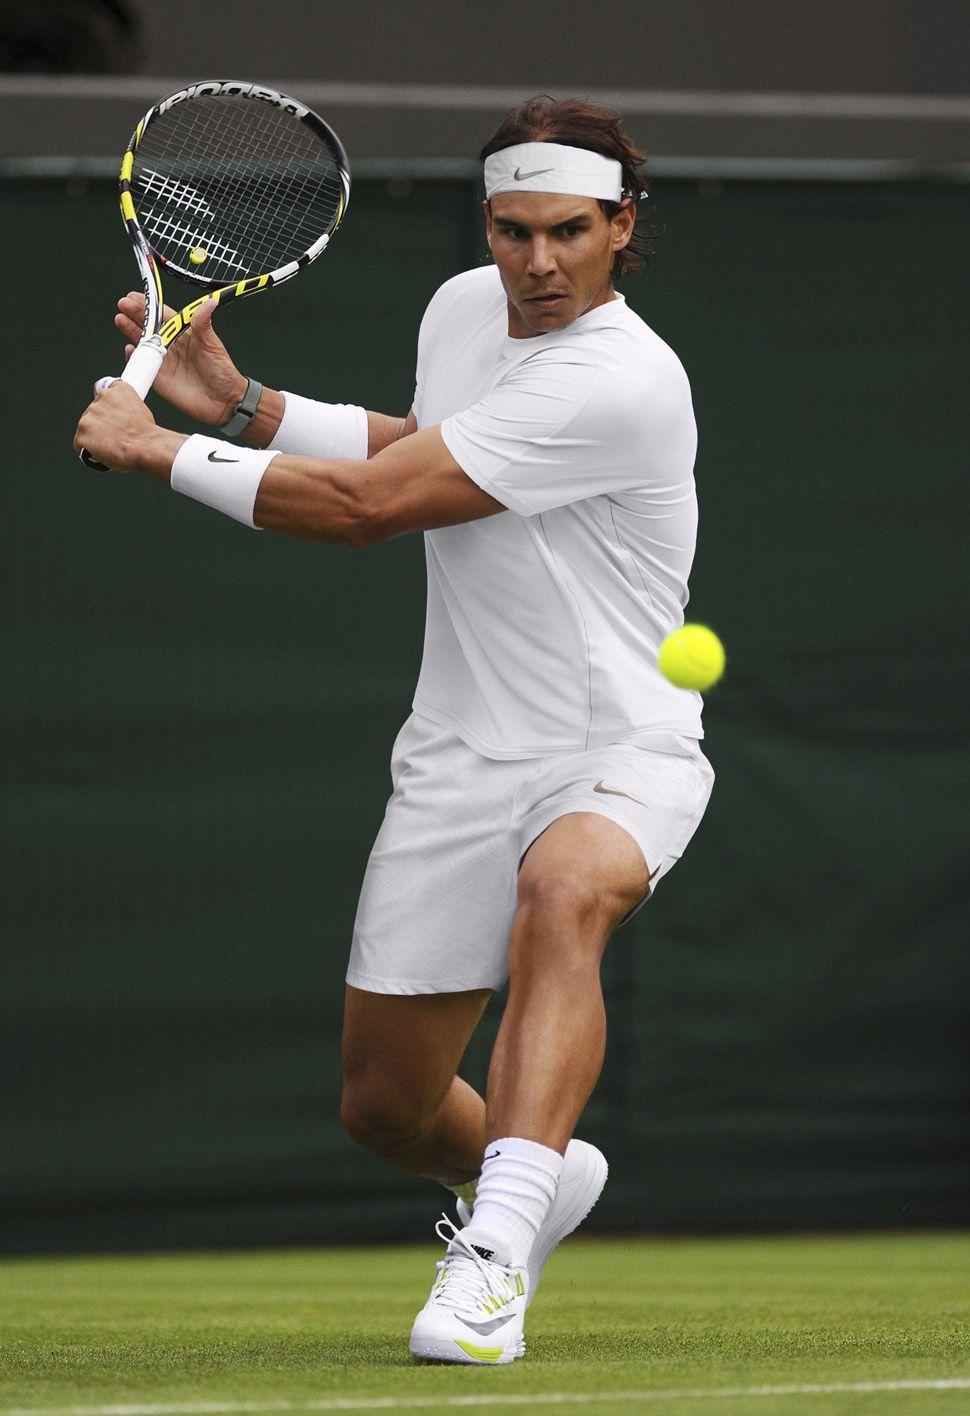 Nike Tennis Collection for Wimbledon 2014 Rafael nadal